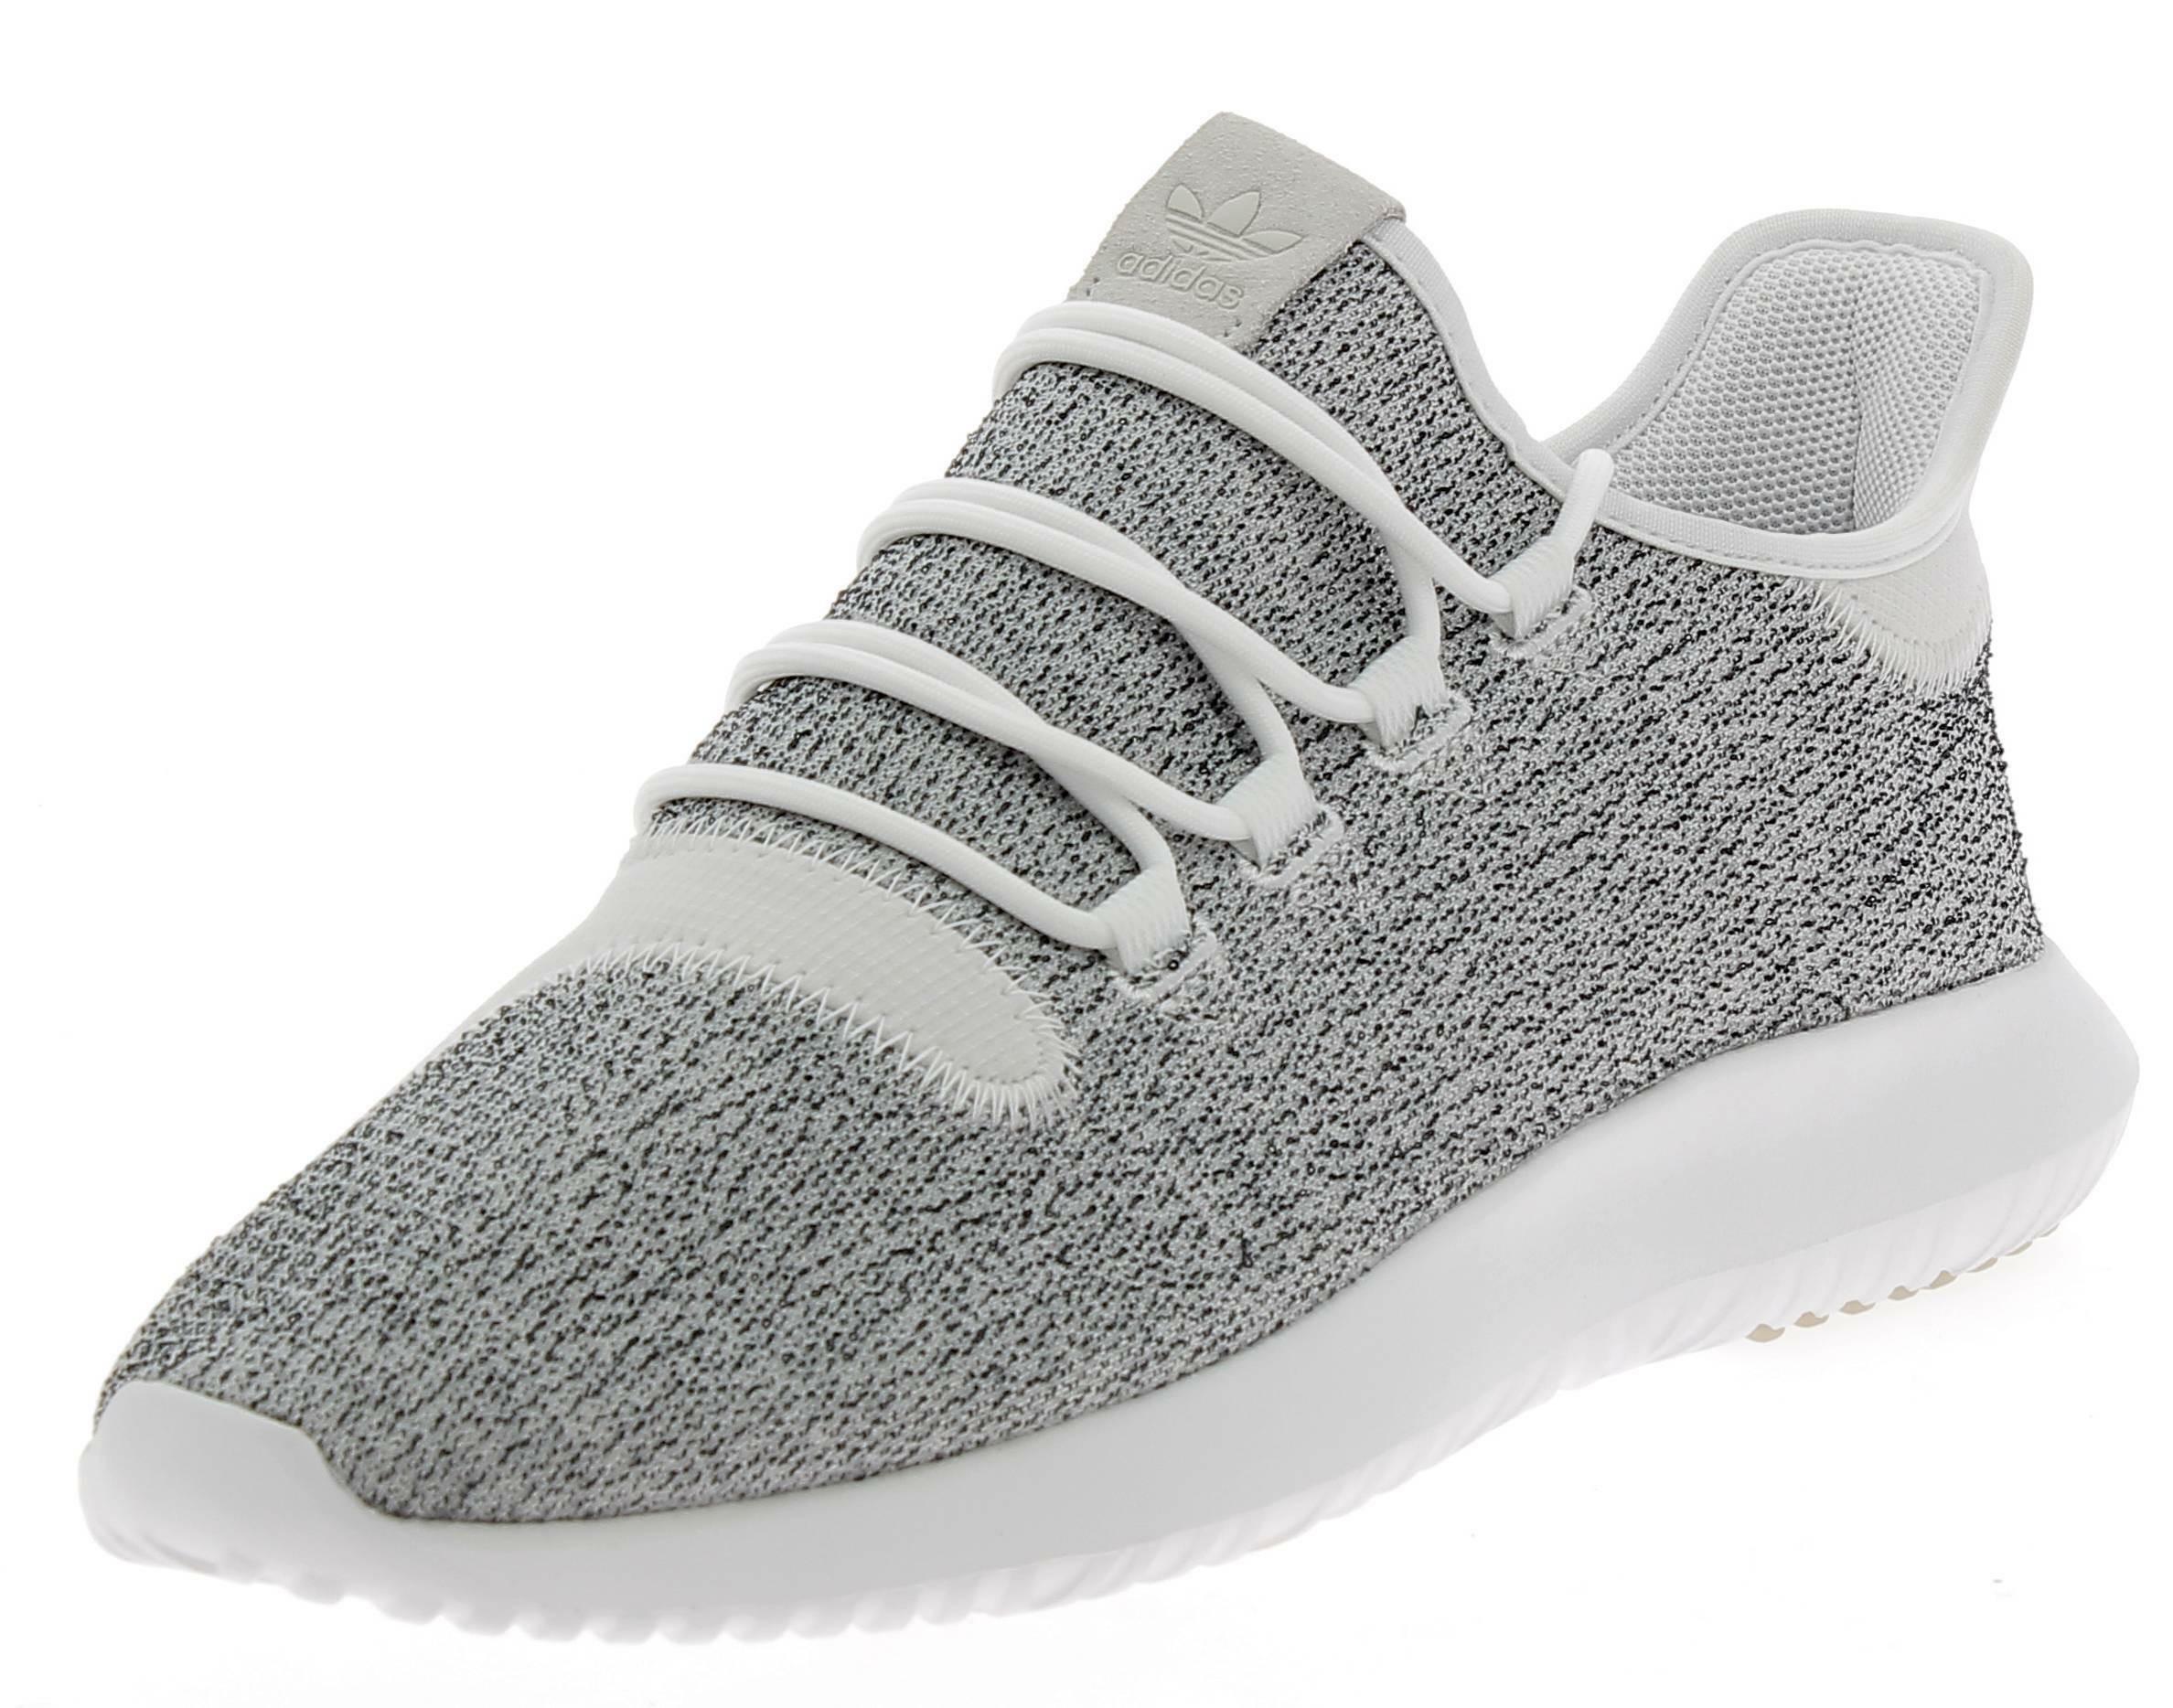 lmxg238g2ihh Economici Adidas Scarpe Uomo Barricade Team 4